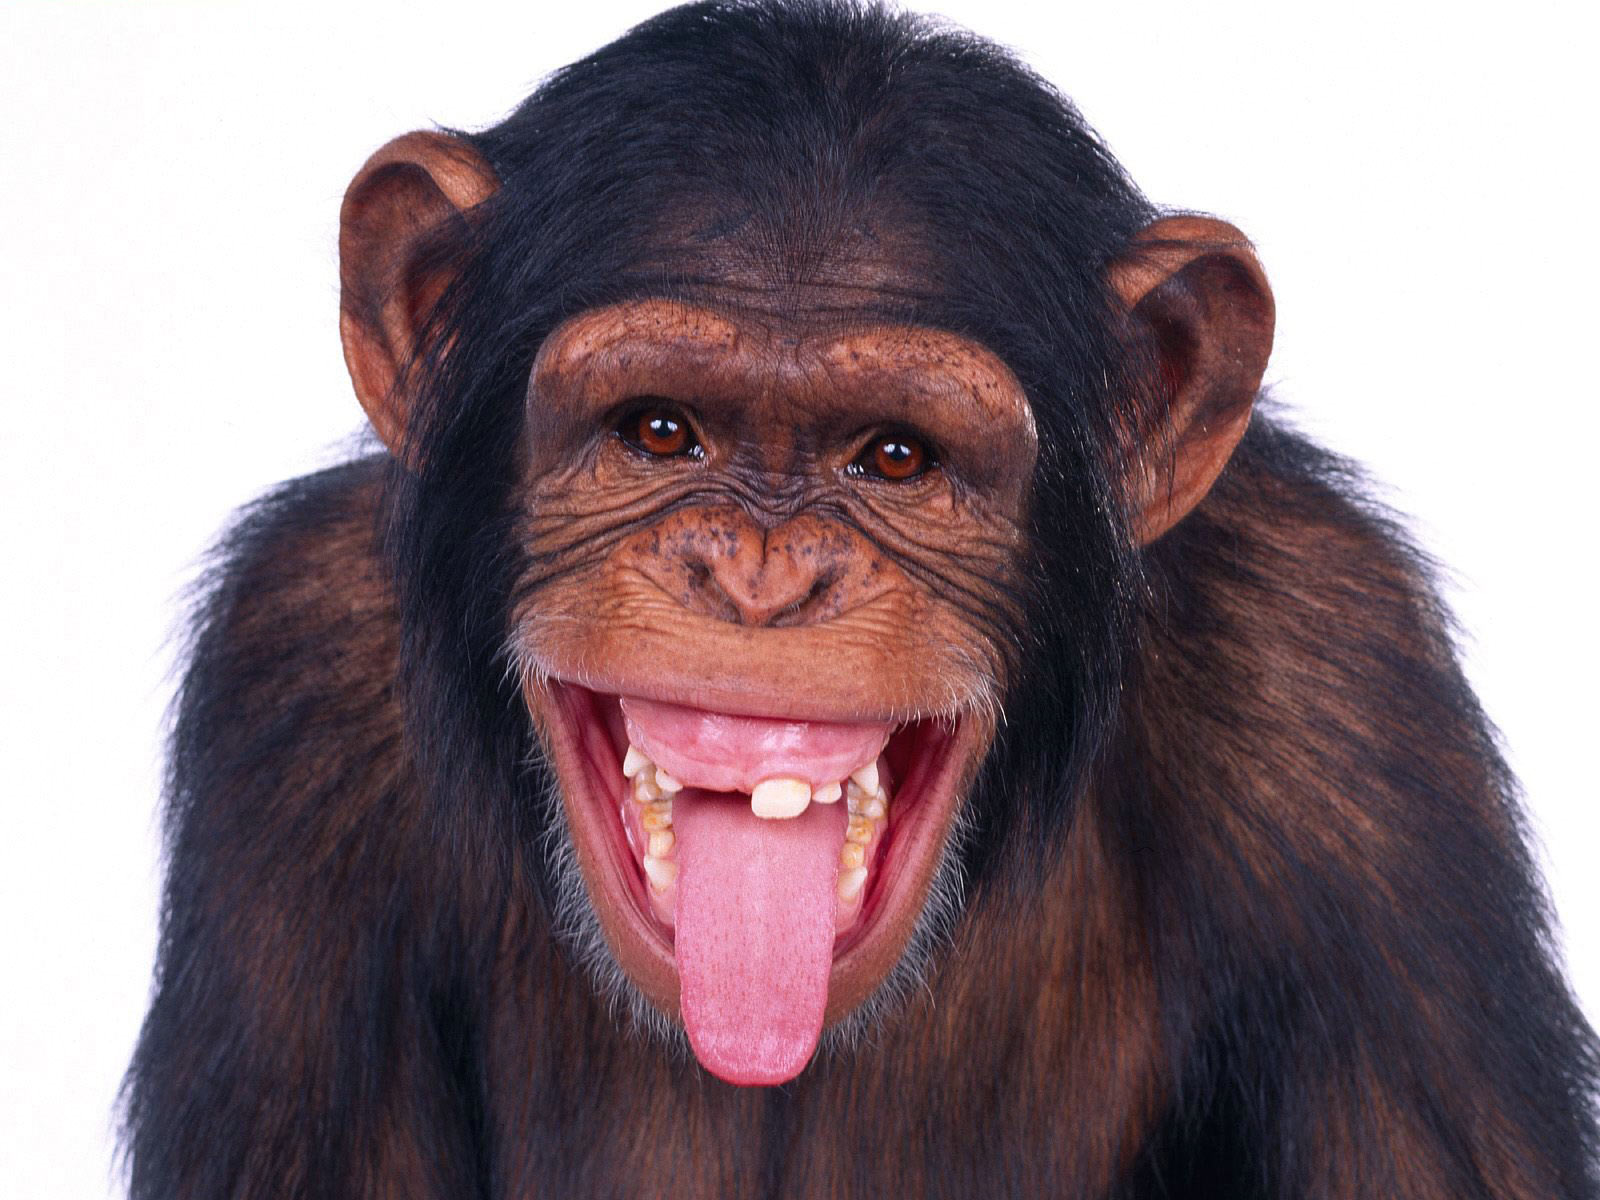 http://3.bp.blogspot.com/-TS8NYBhdSio/UBklxCdCMeI/AAAAAAAAFY0/gaAvfAocMoc/s1600/Chimpanzees+wallpapers+3.jpg